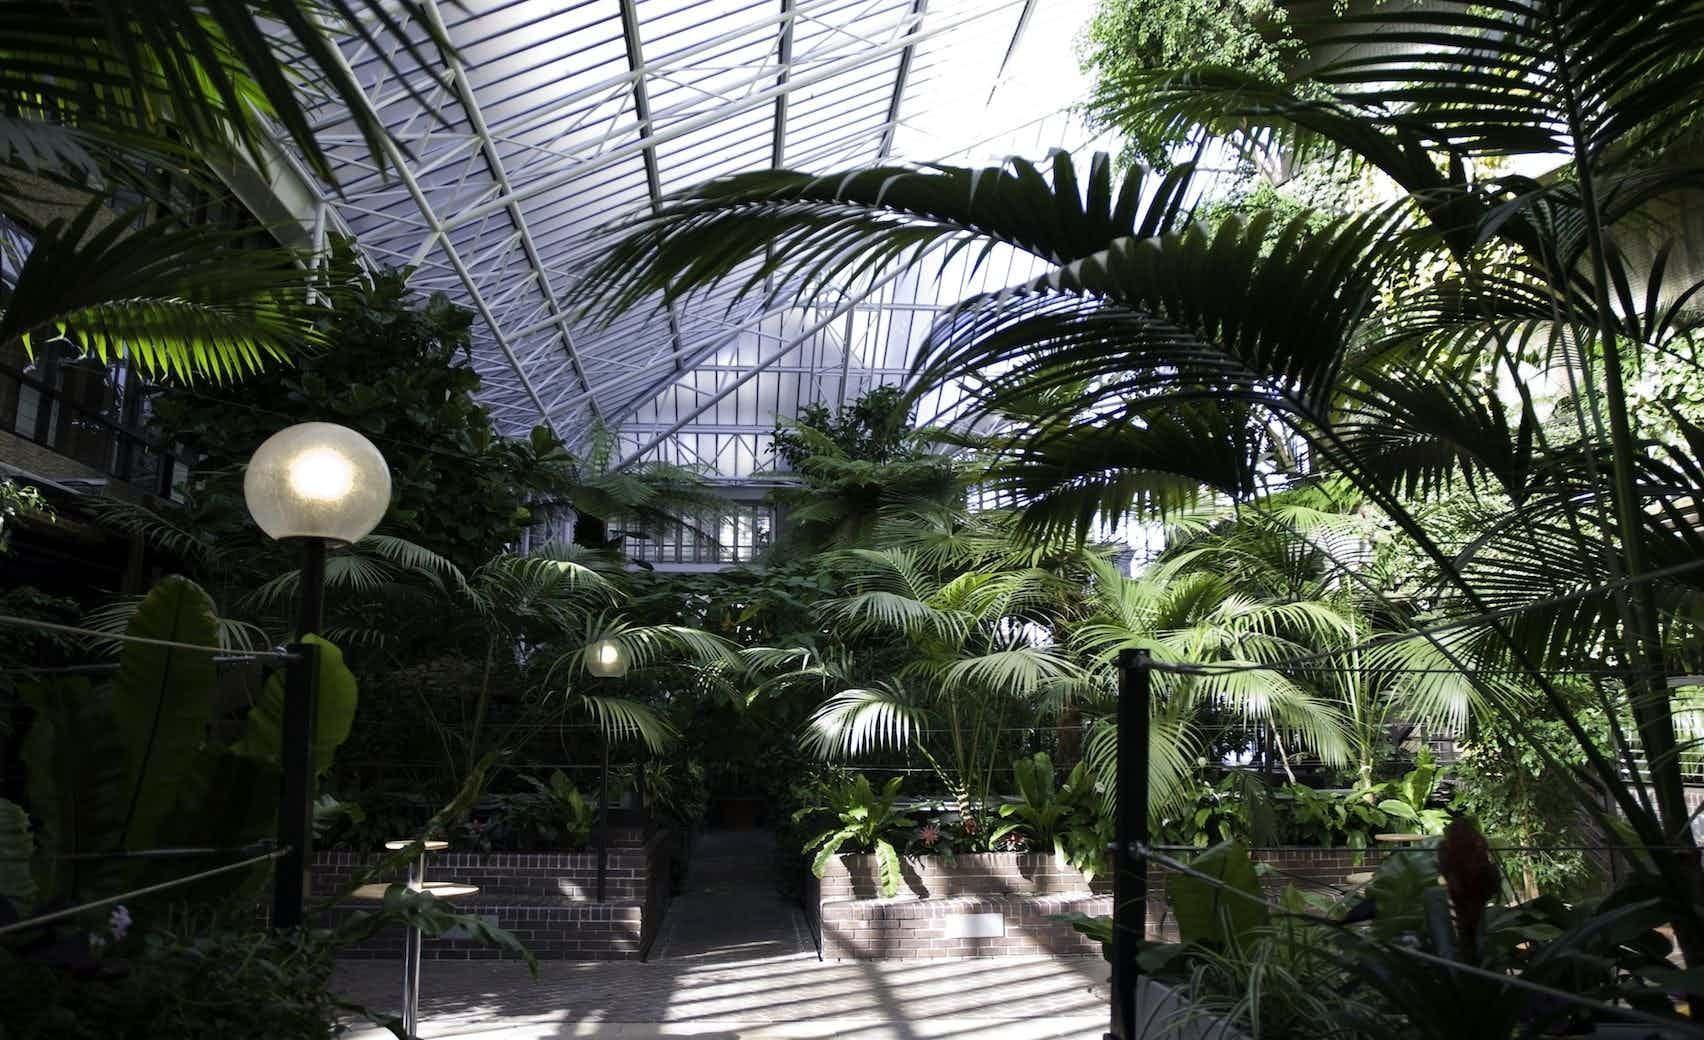 Conservatory, Barbican